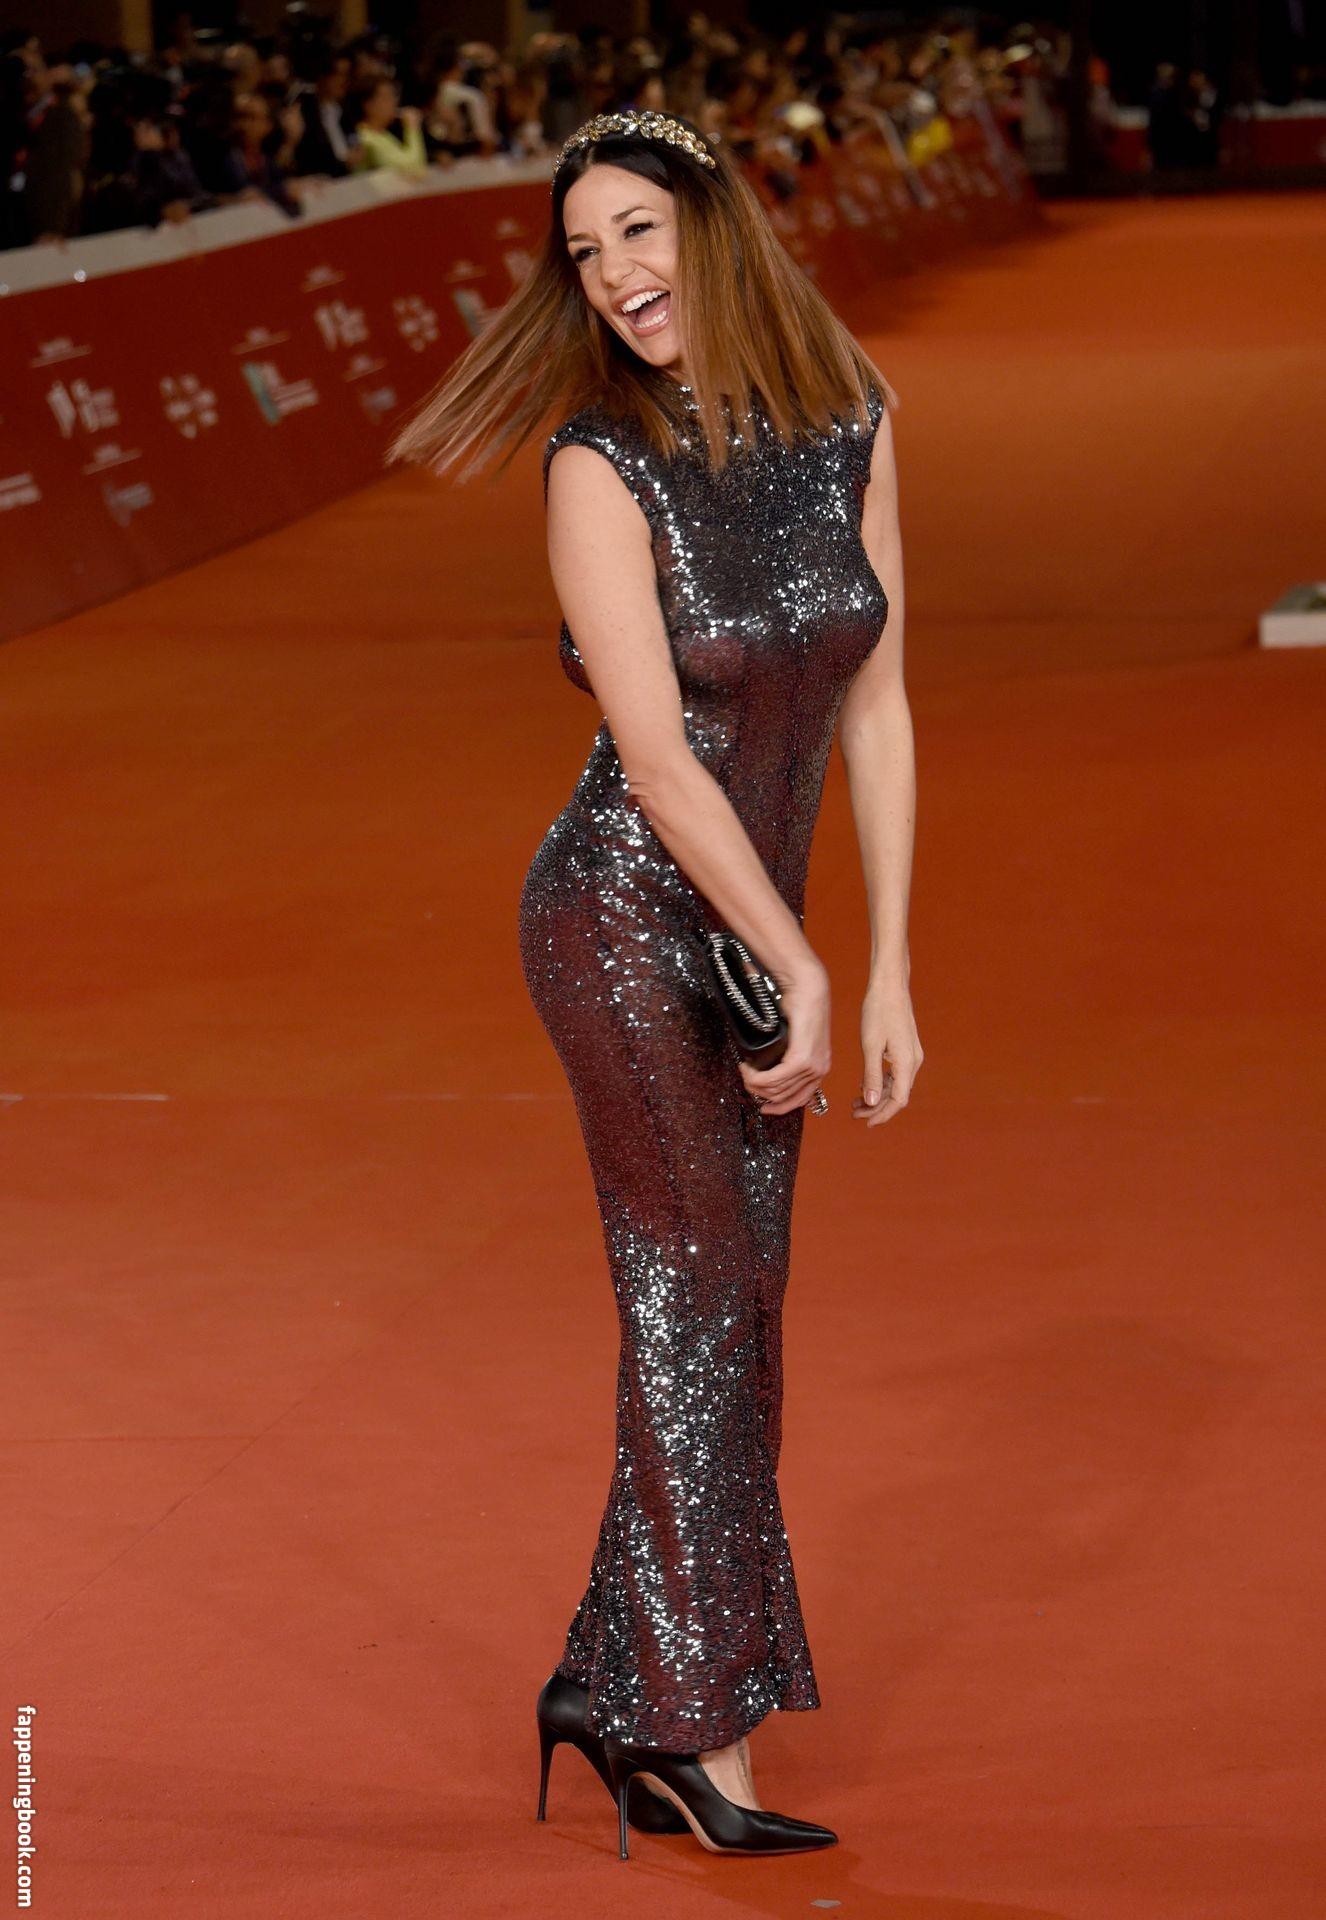 Alessia Fabiani Nude, Sexy, The Fappening, Uncensored